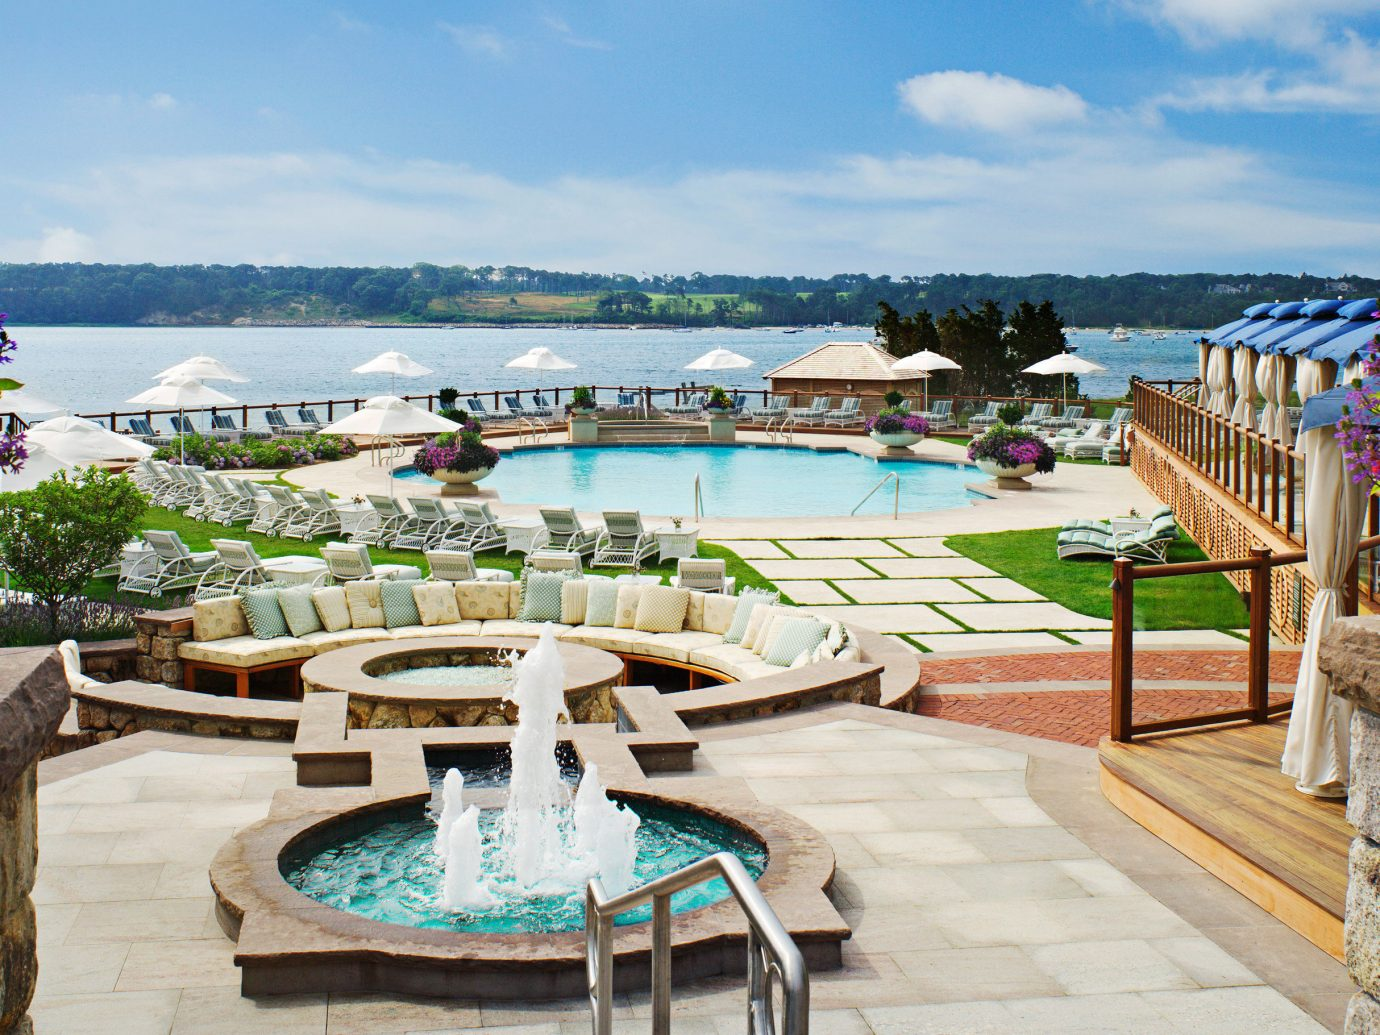 sky outdoor leisure swimming pool property Resort estate vacation Villa backyard real estate caribbean overlooking furniture